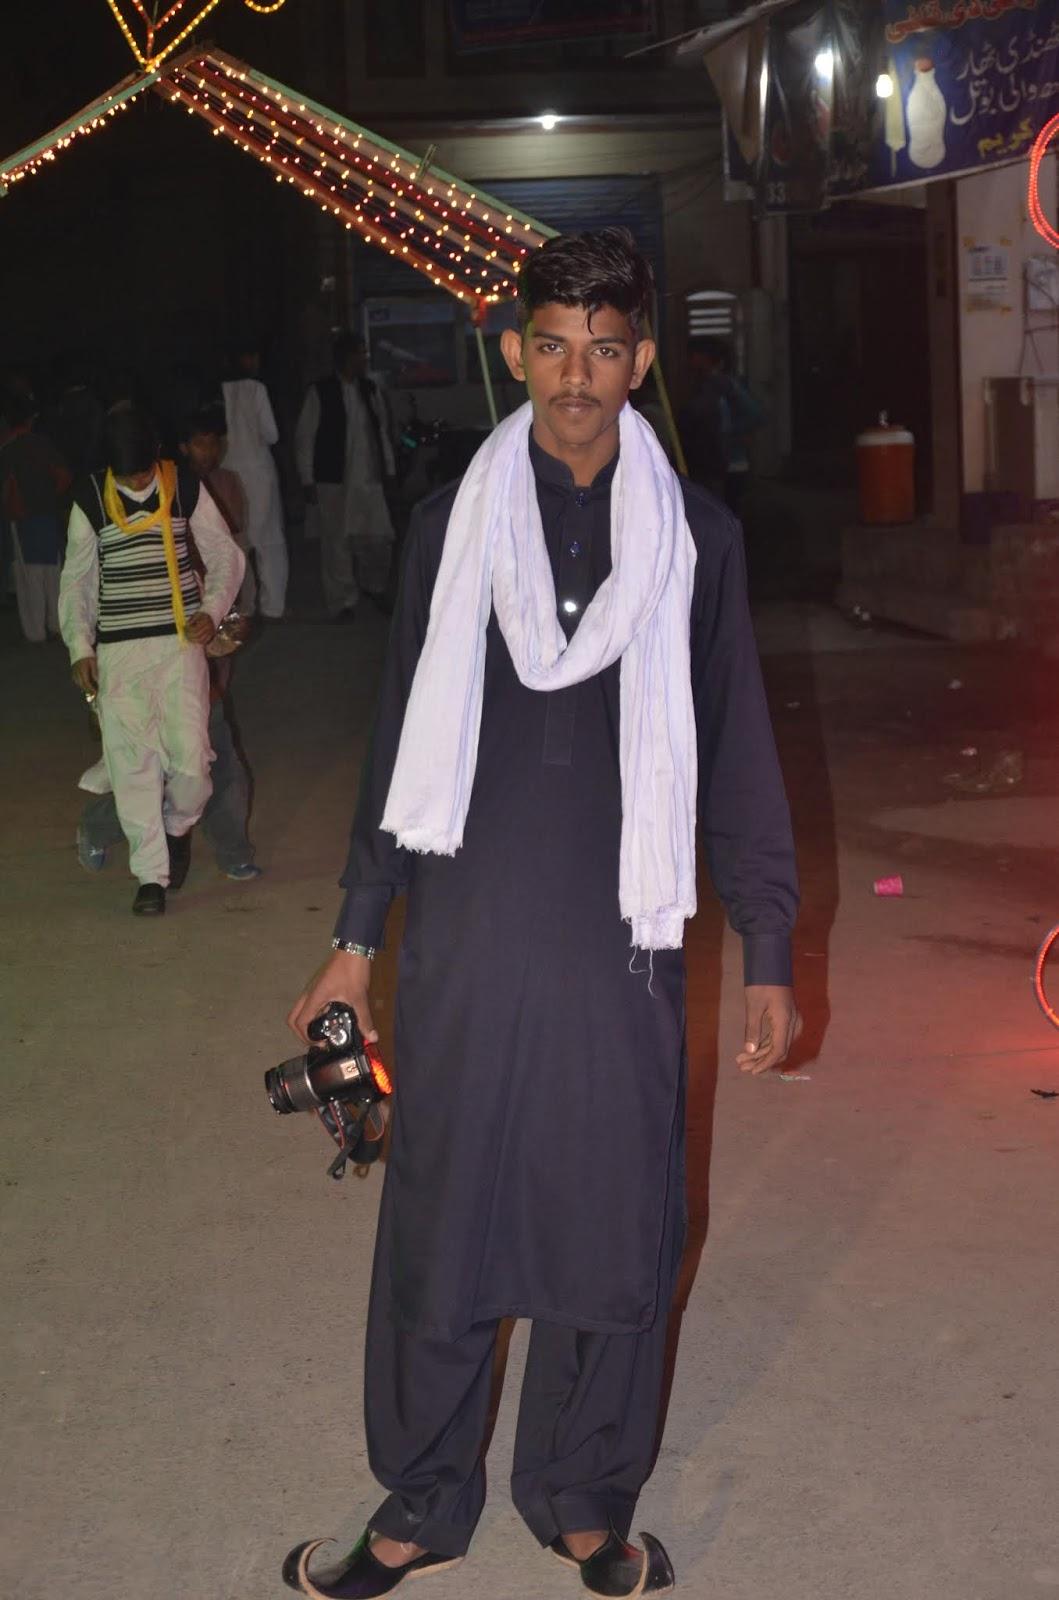 M Bilal Rajpoot Portraits Collection - Muhammad Bilal